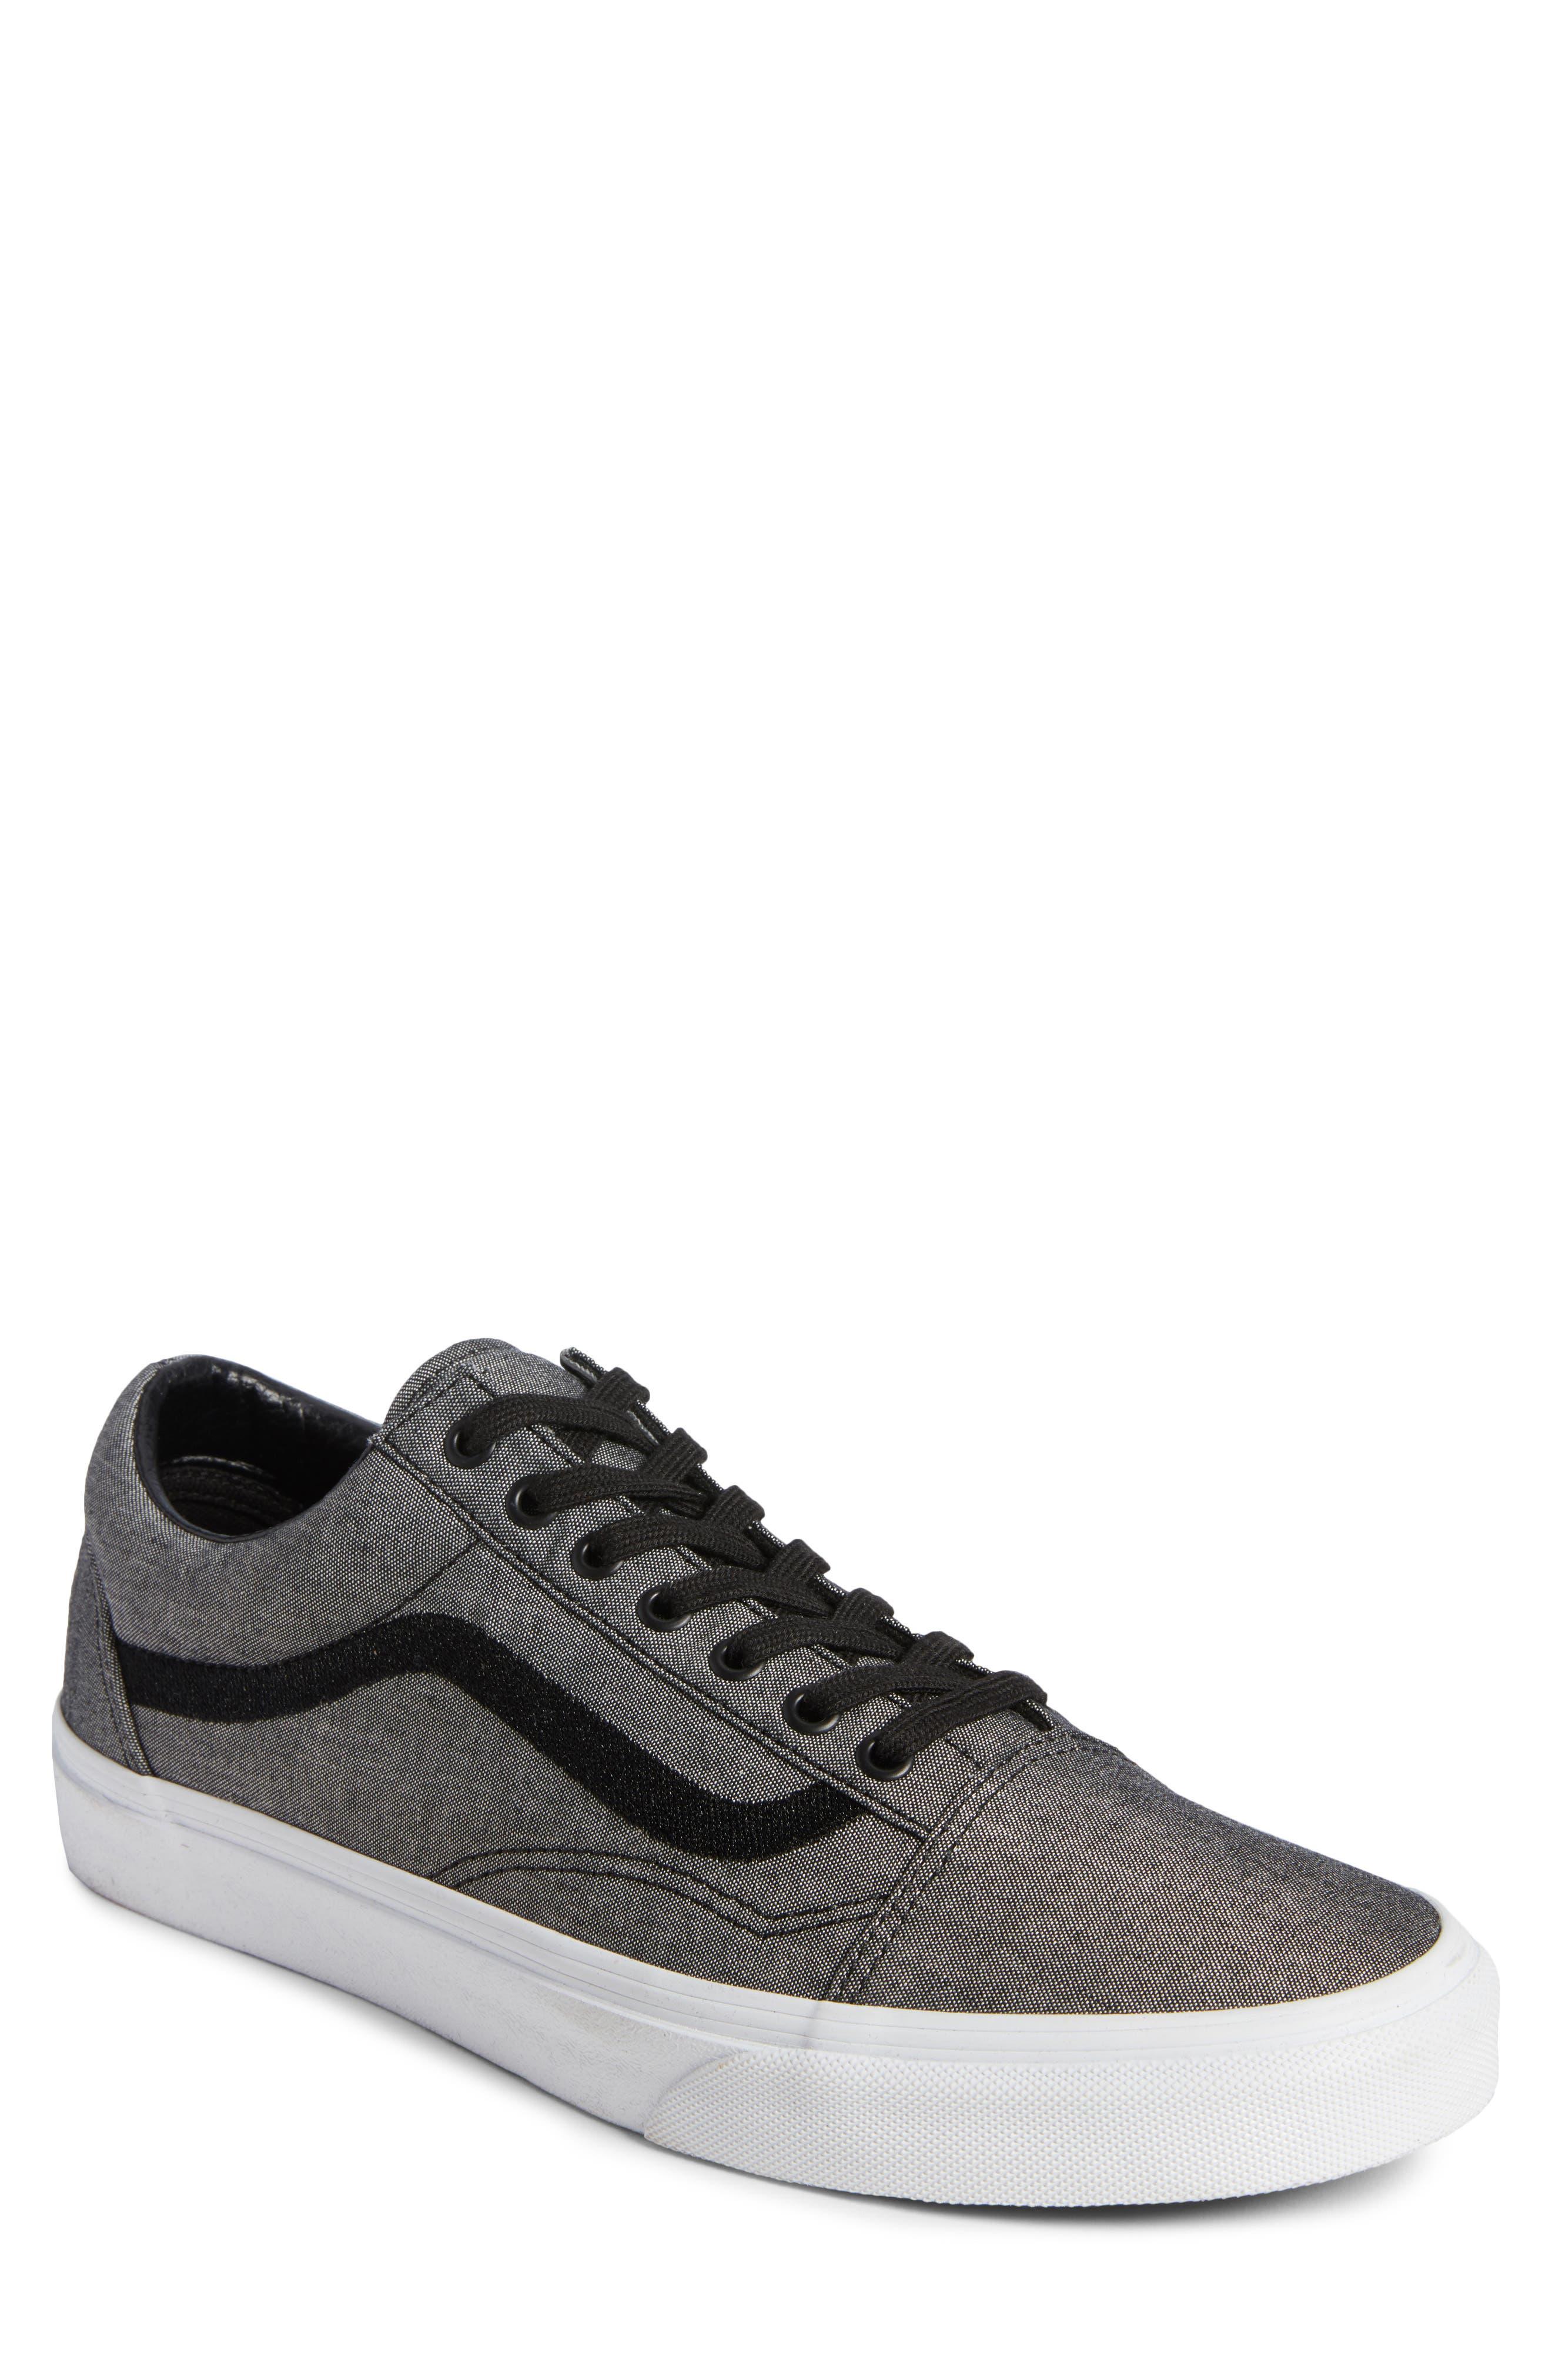 Old Skool Sneaker,                             Main thumbnail 1, color,                             Black/ True White/ Grey